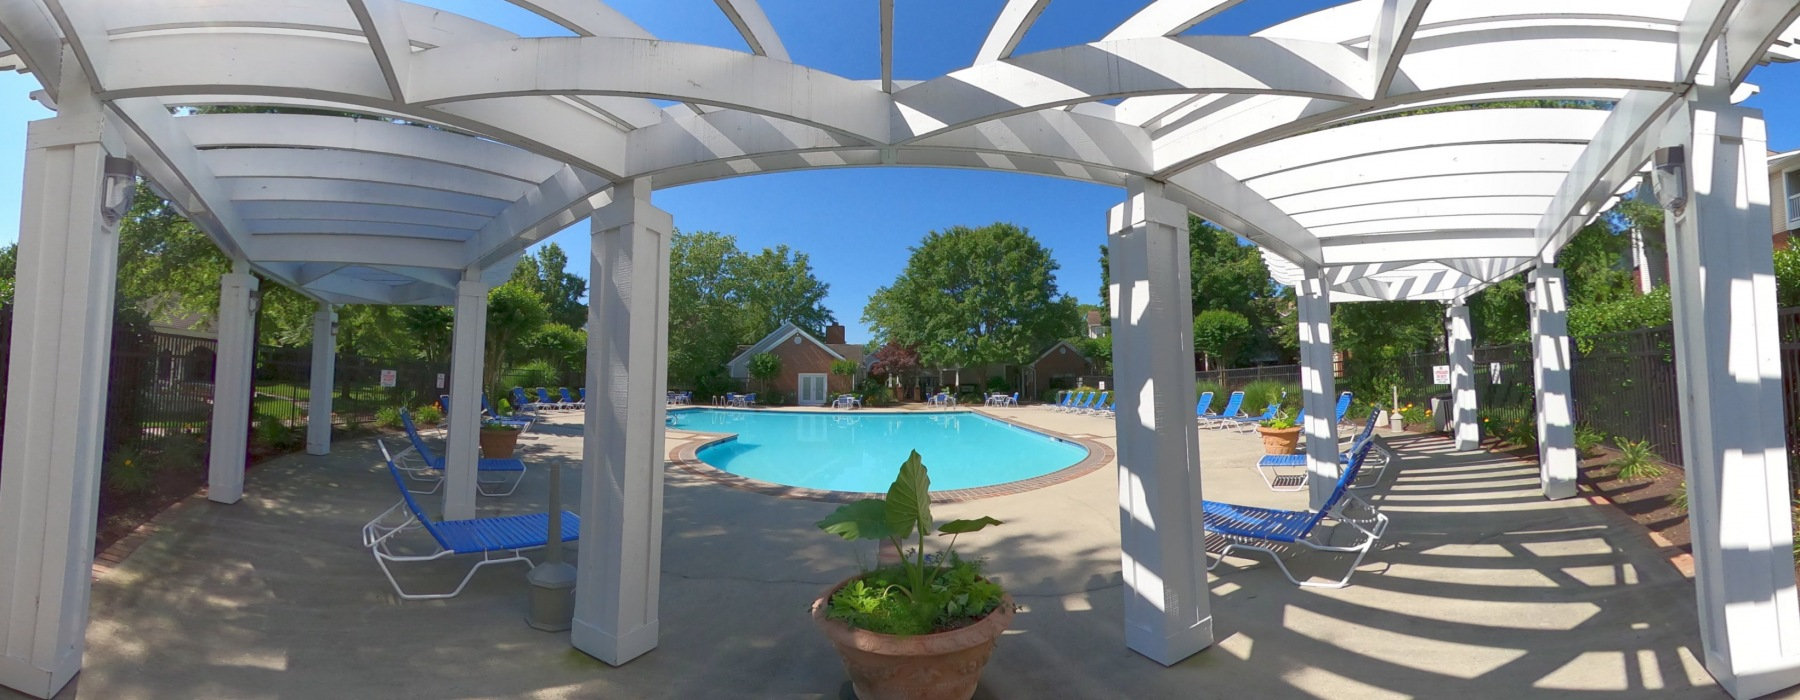 Wide angle photo of pergola at swimming pool